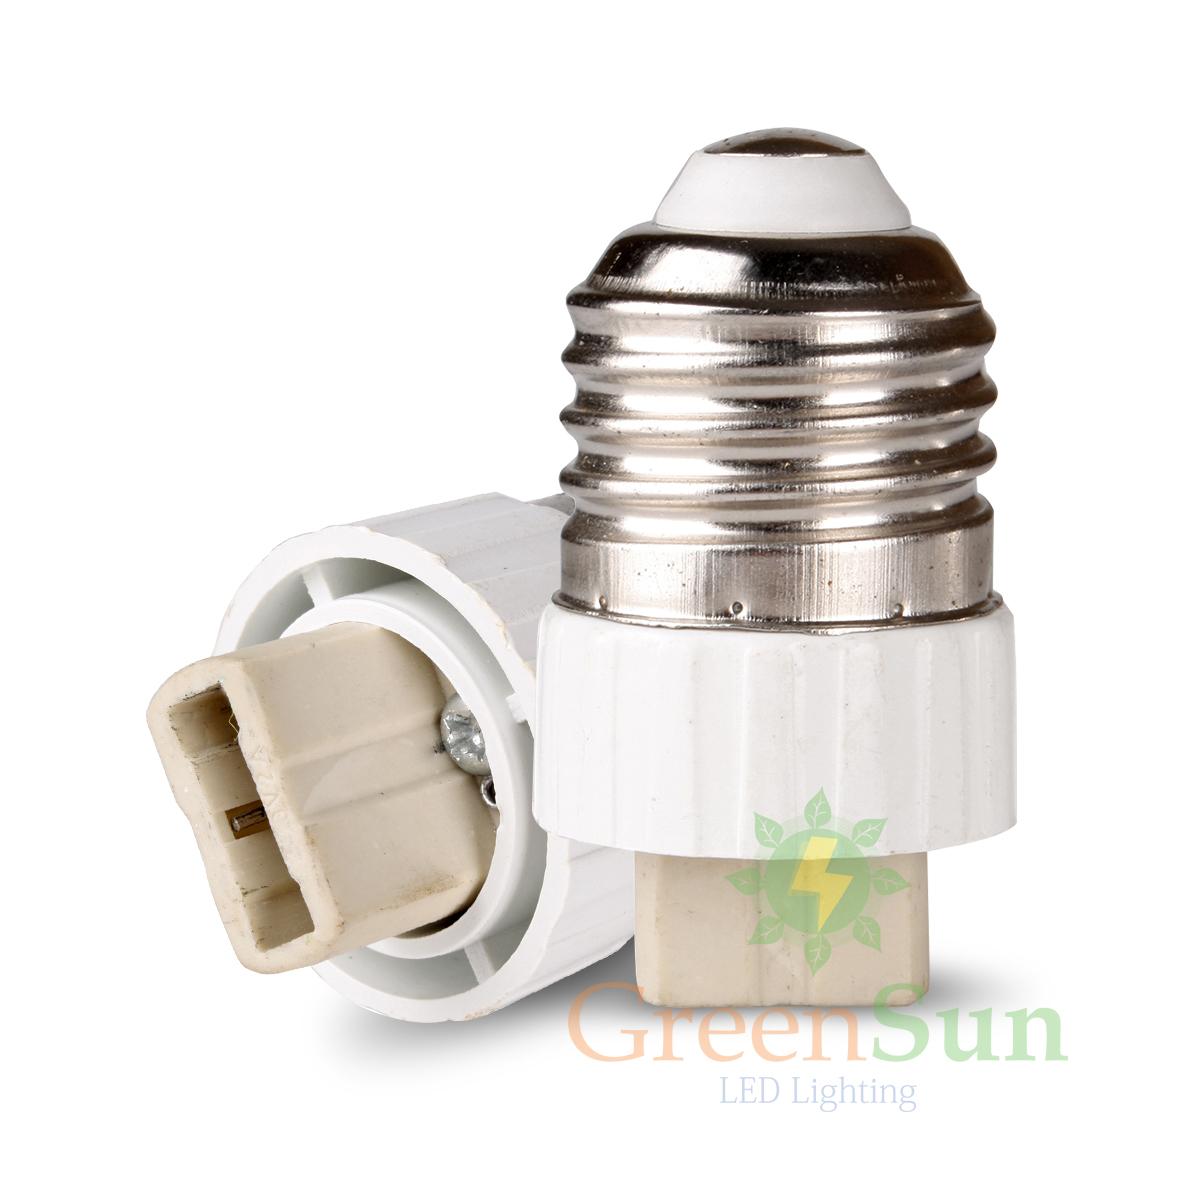 adaptateur douille e27 mr16 gu10 e14 led ampoule lampe culot eclairage ebay. Black Bedroom Furniture Sets. Home Design Ideas